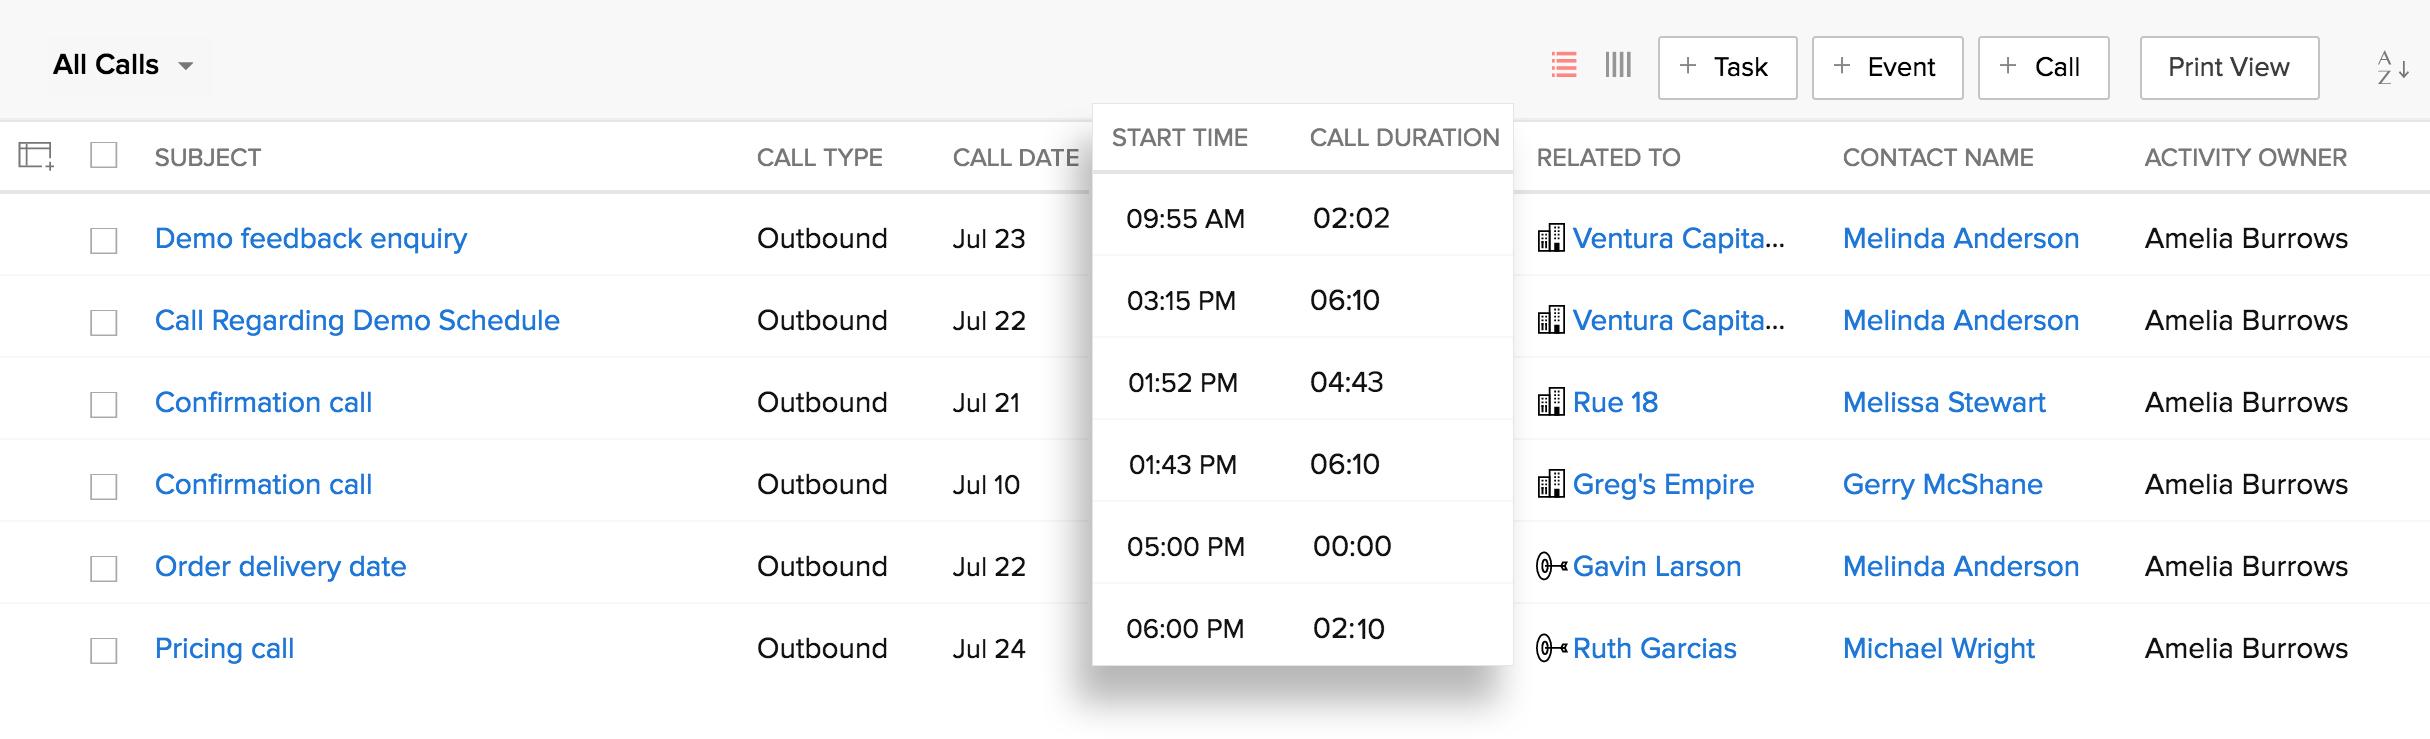 Telephony   Make customer calls from inside Zoho CRM